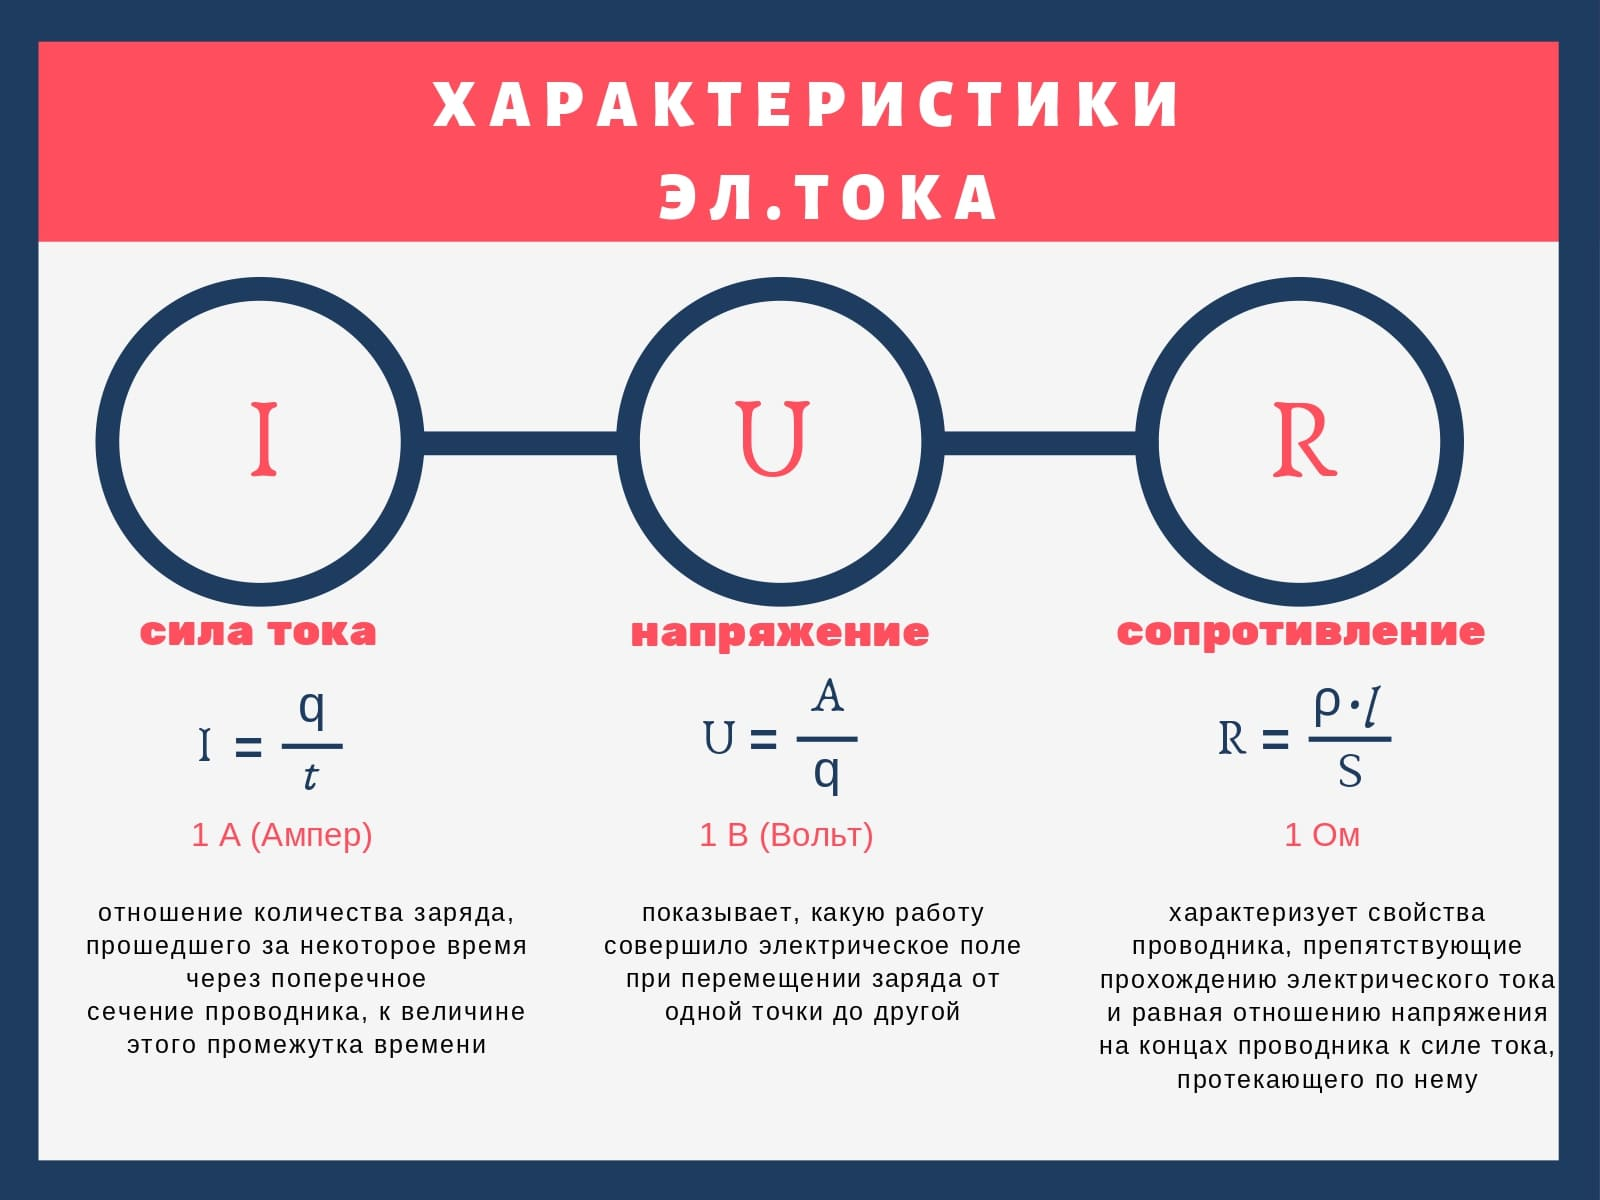 Характеристики эл. тока